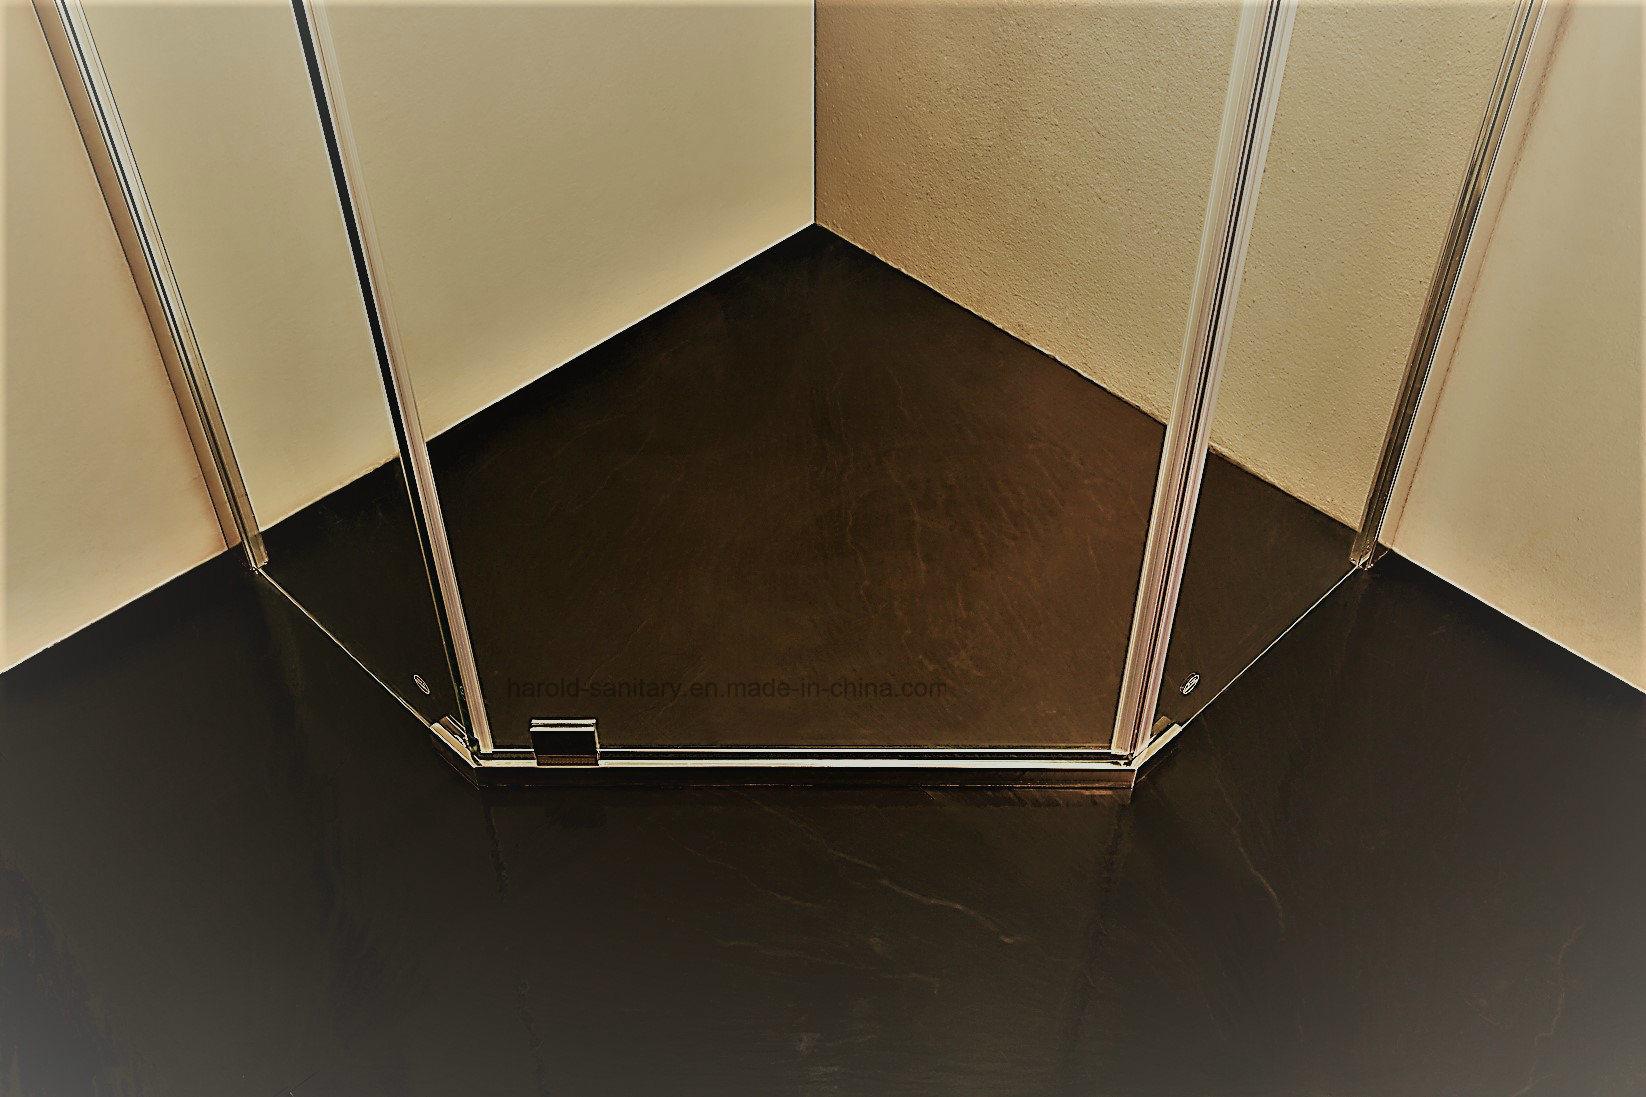 HR-P050 Diamond Shape Pivot Hinge Open Shower Enclosure